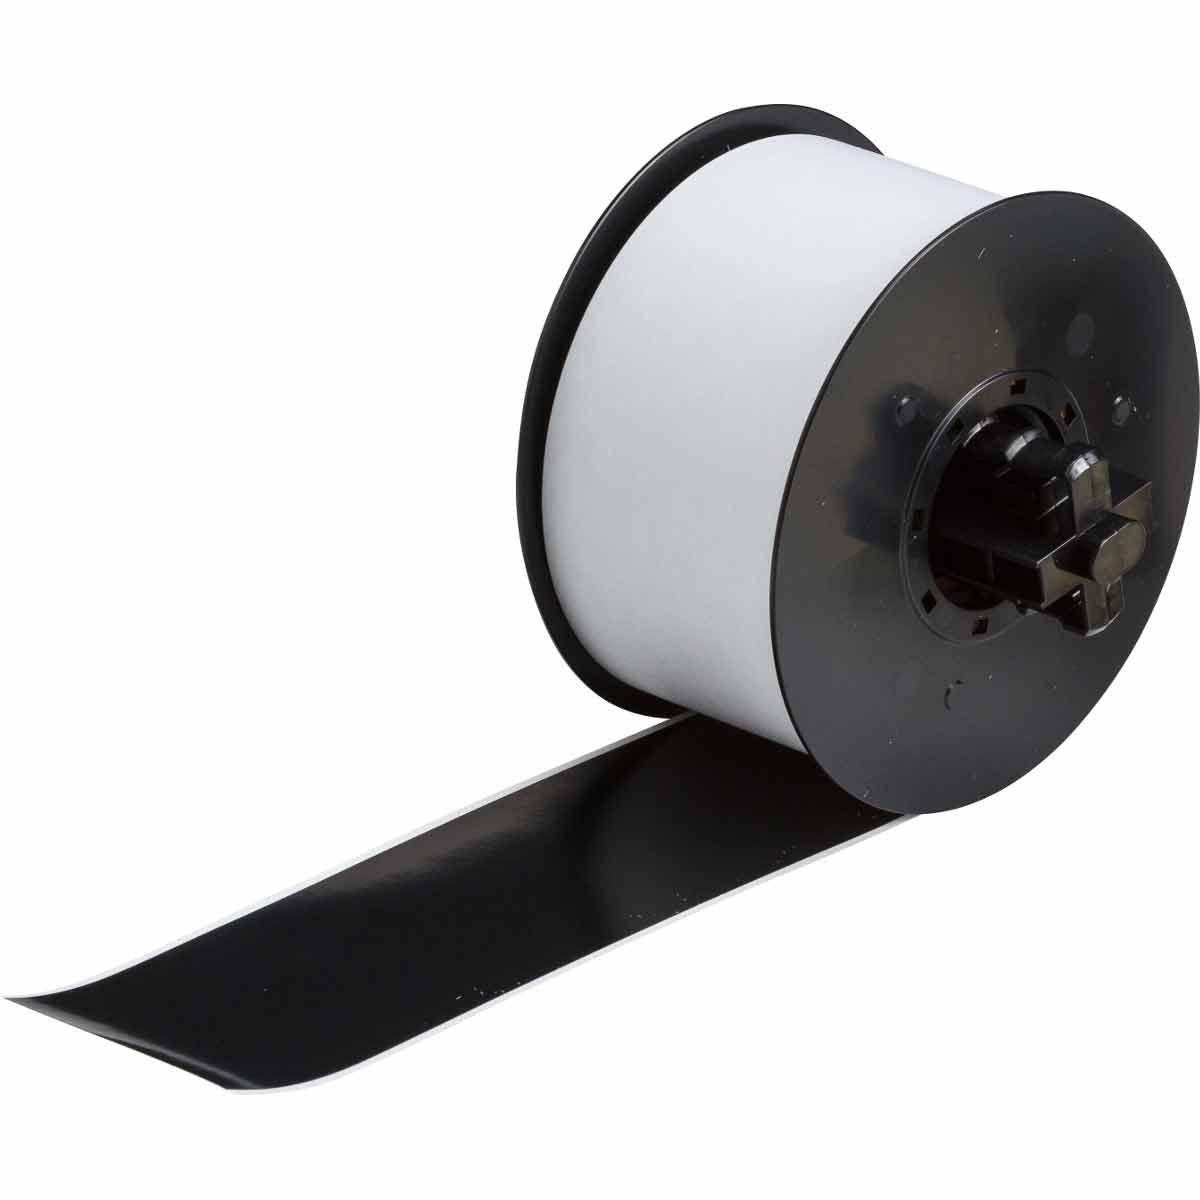 brady part 113213 minimark series indoor outdoor vinyl labels. Black Bedroom Furniture Sets. Home Design Ideas